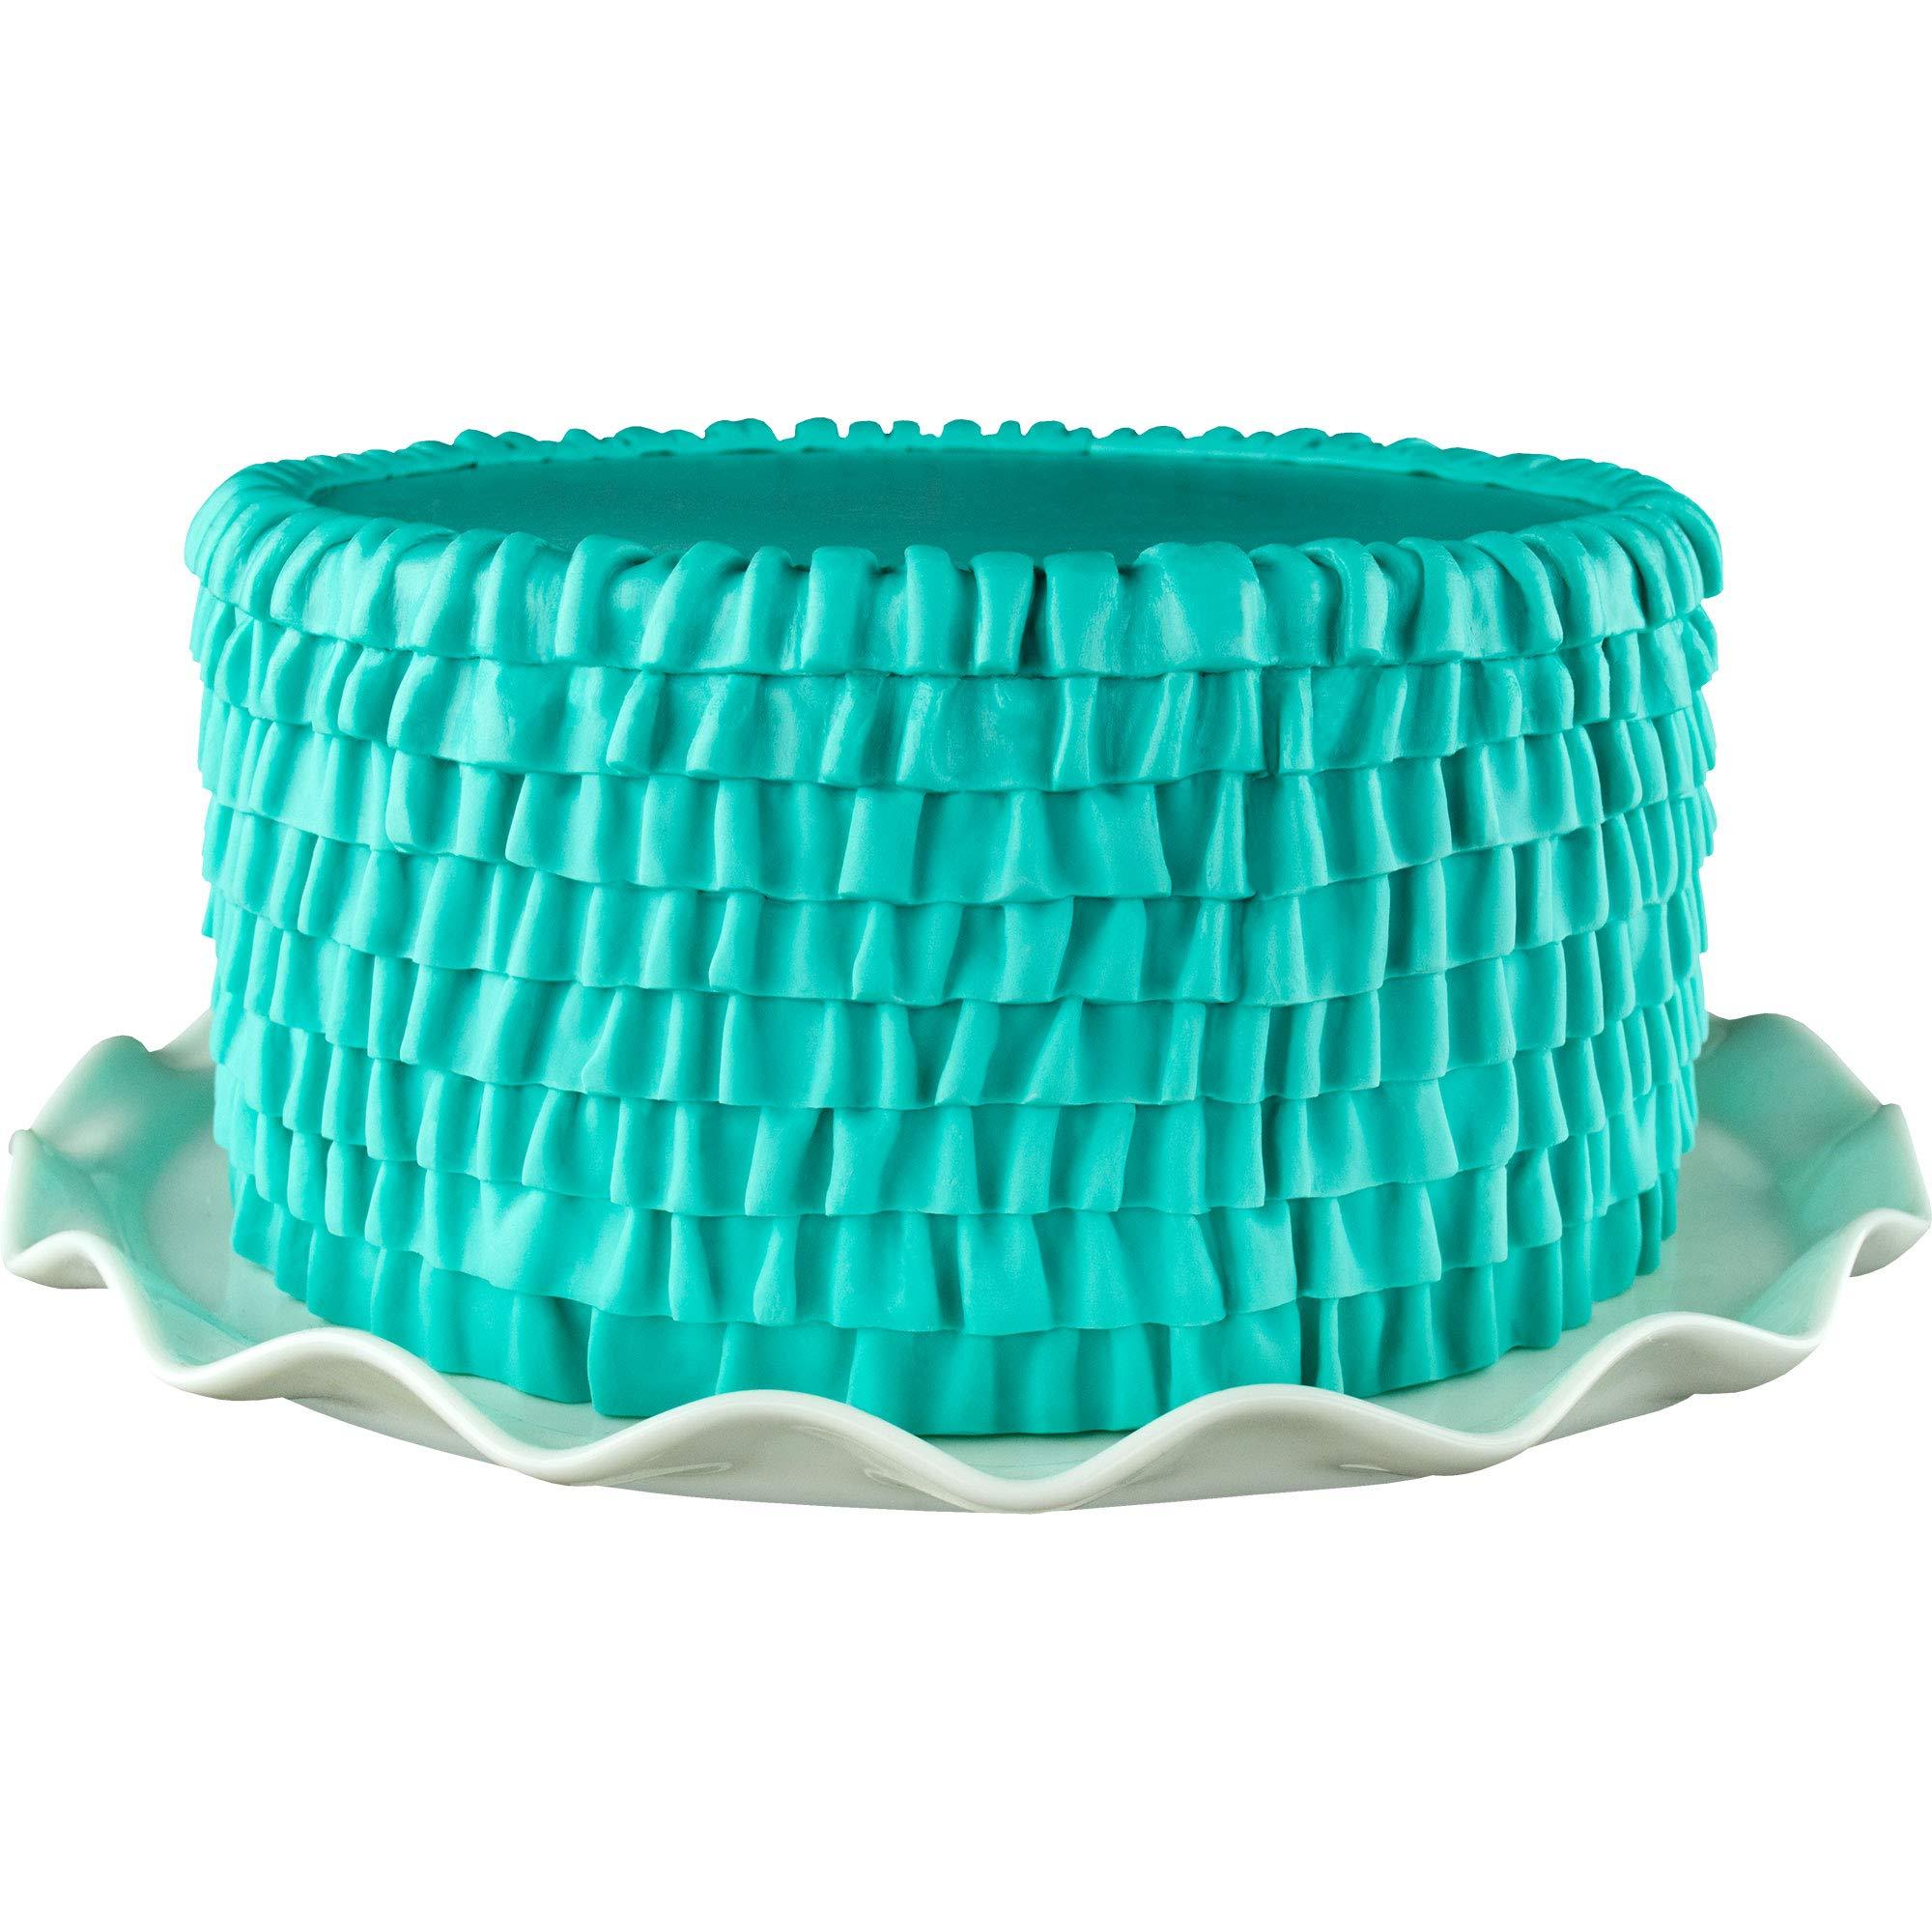 Marvelous Molds Romantic Ruffle Simpress Silicone Mold   Cake Decorating   Fondant   Gumpaste Icing by Marvelous Molds (Image #3)